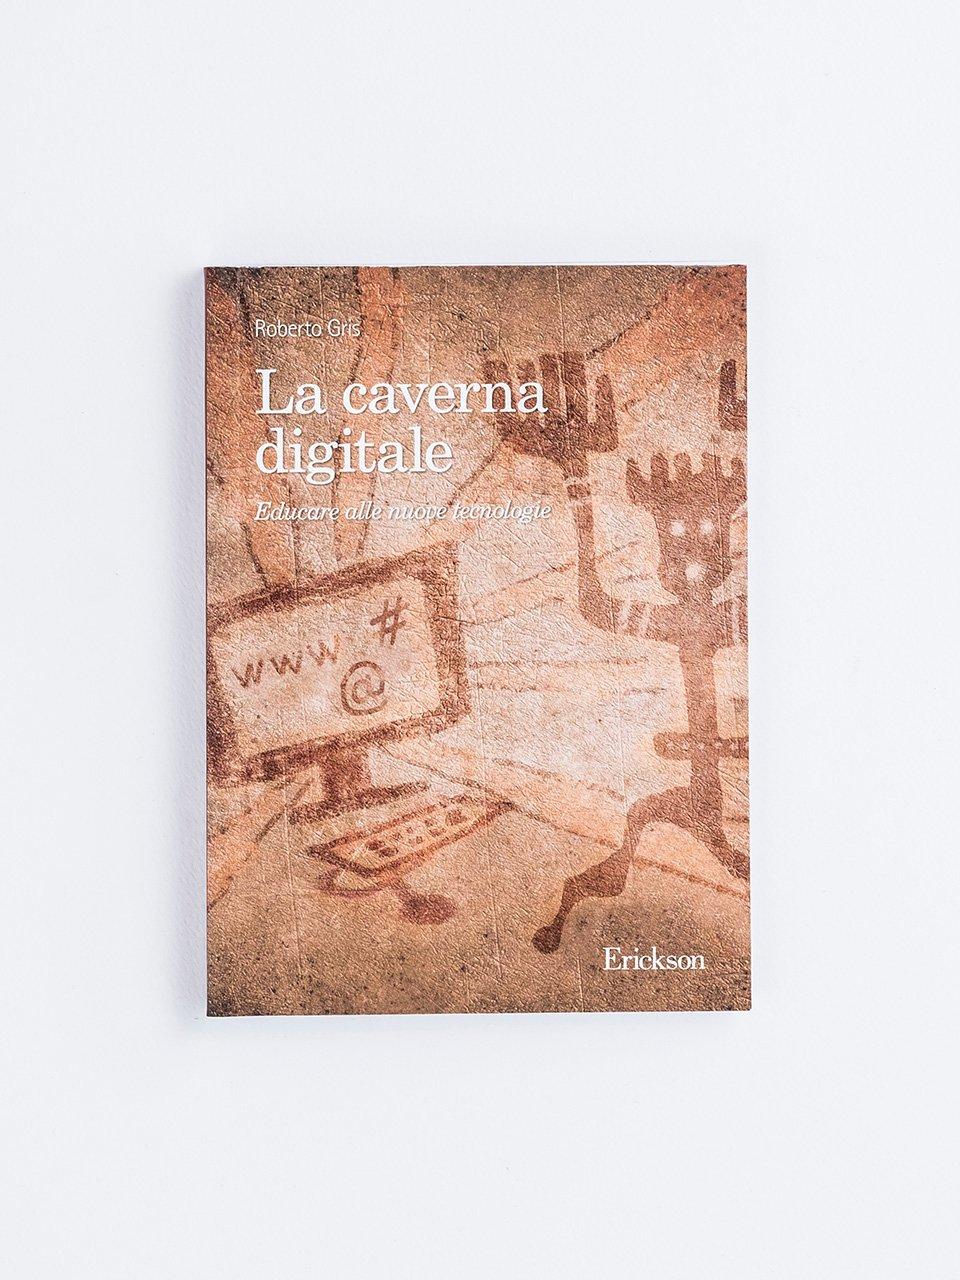 La caverna digitale - Libri - Erickson